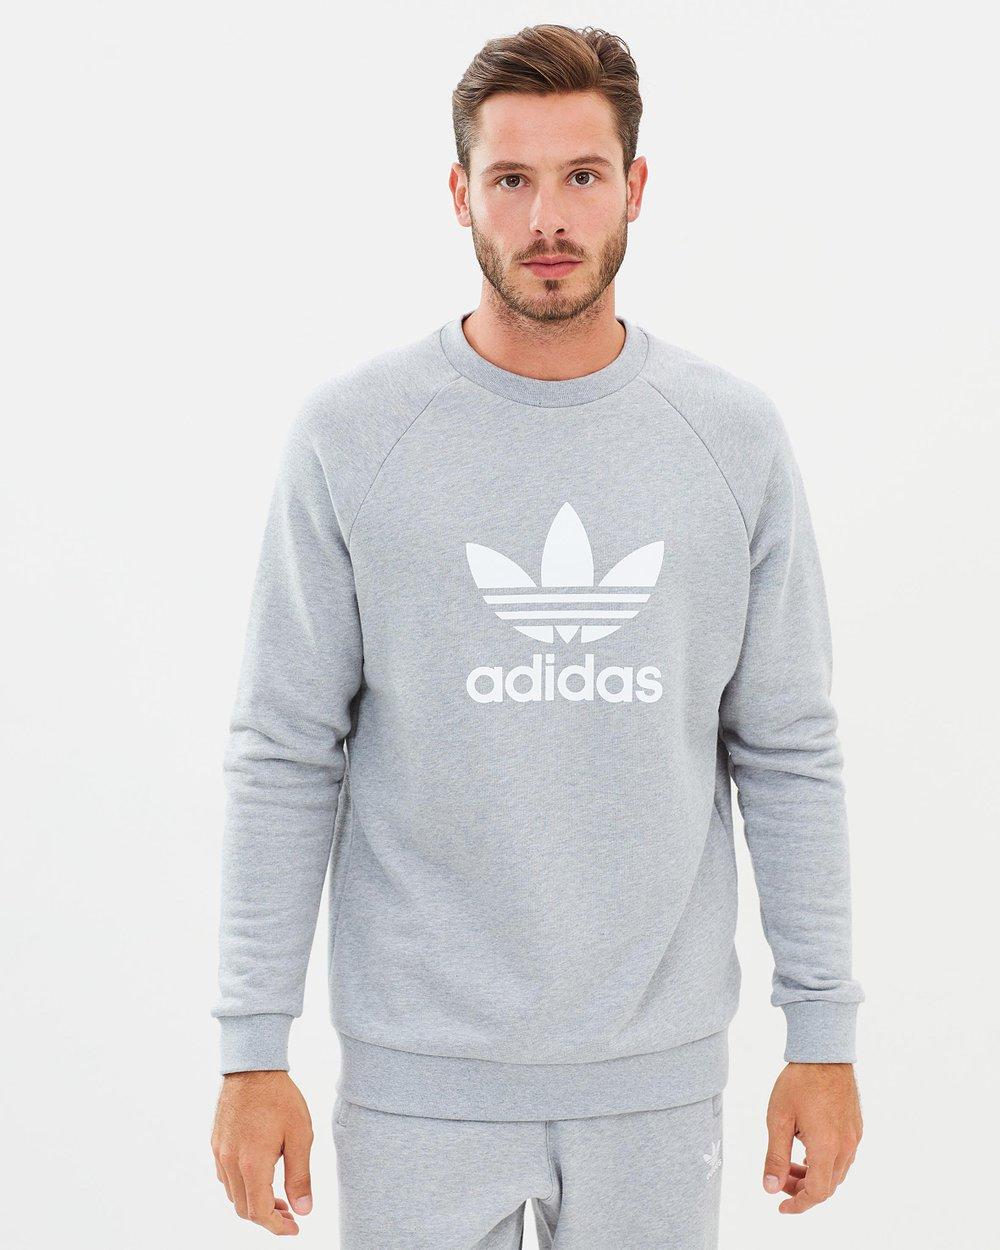 55e271160e Adicolor Trefoil Crew Sweatshirt by adidas Originals Online